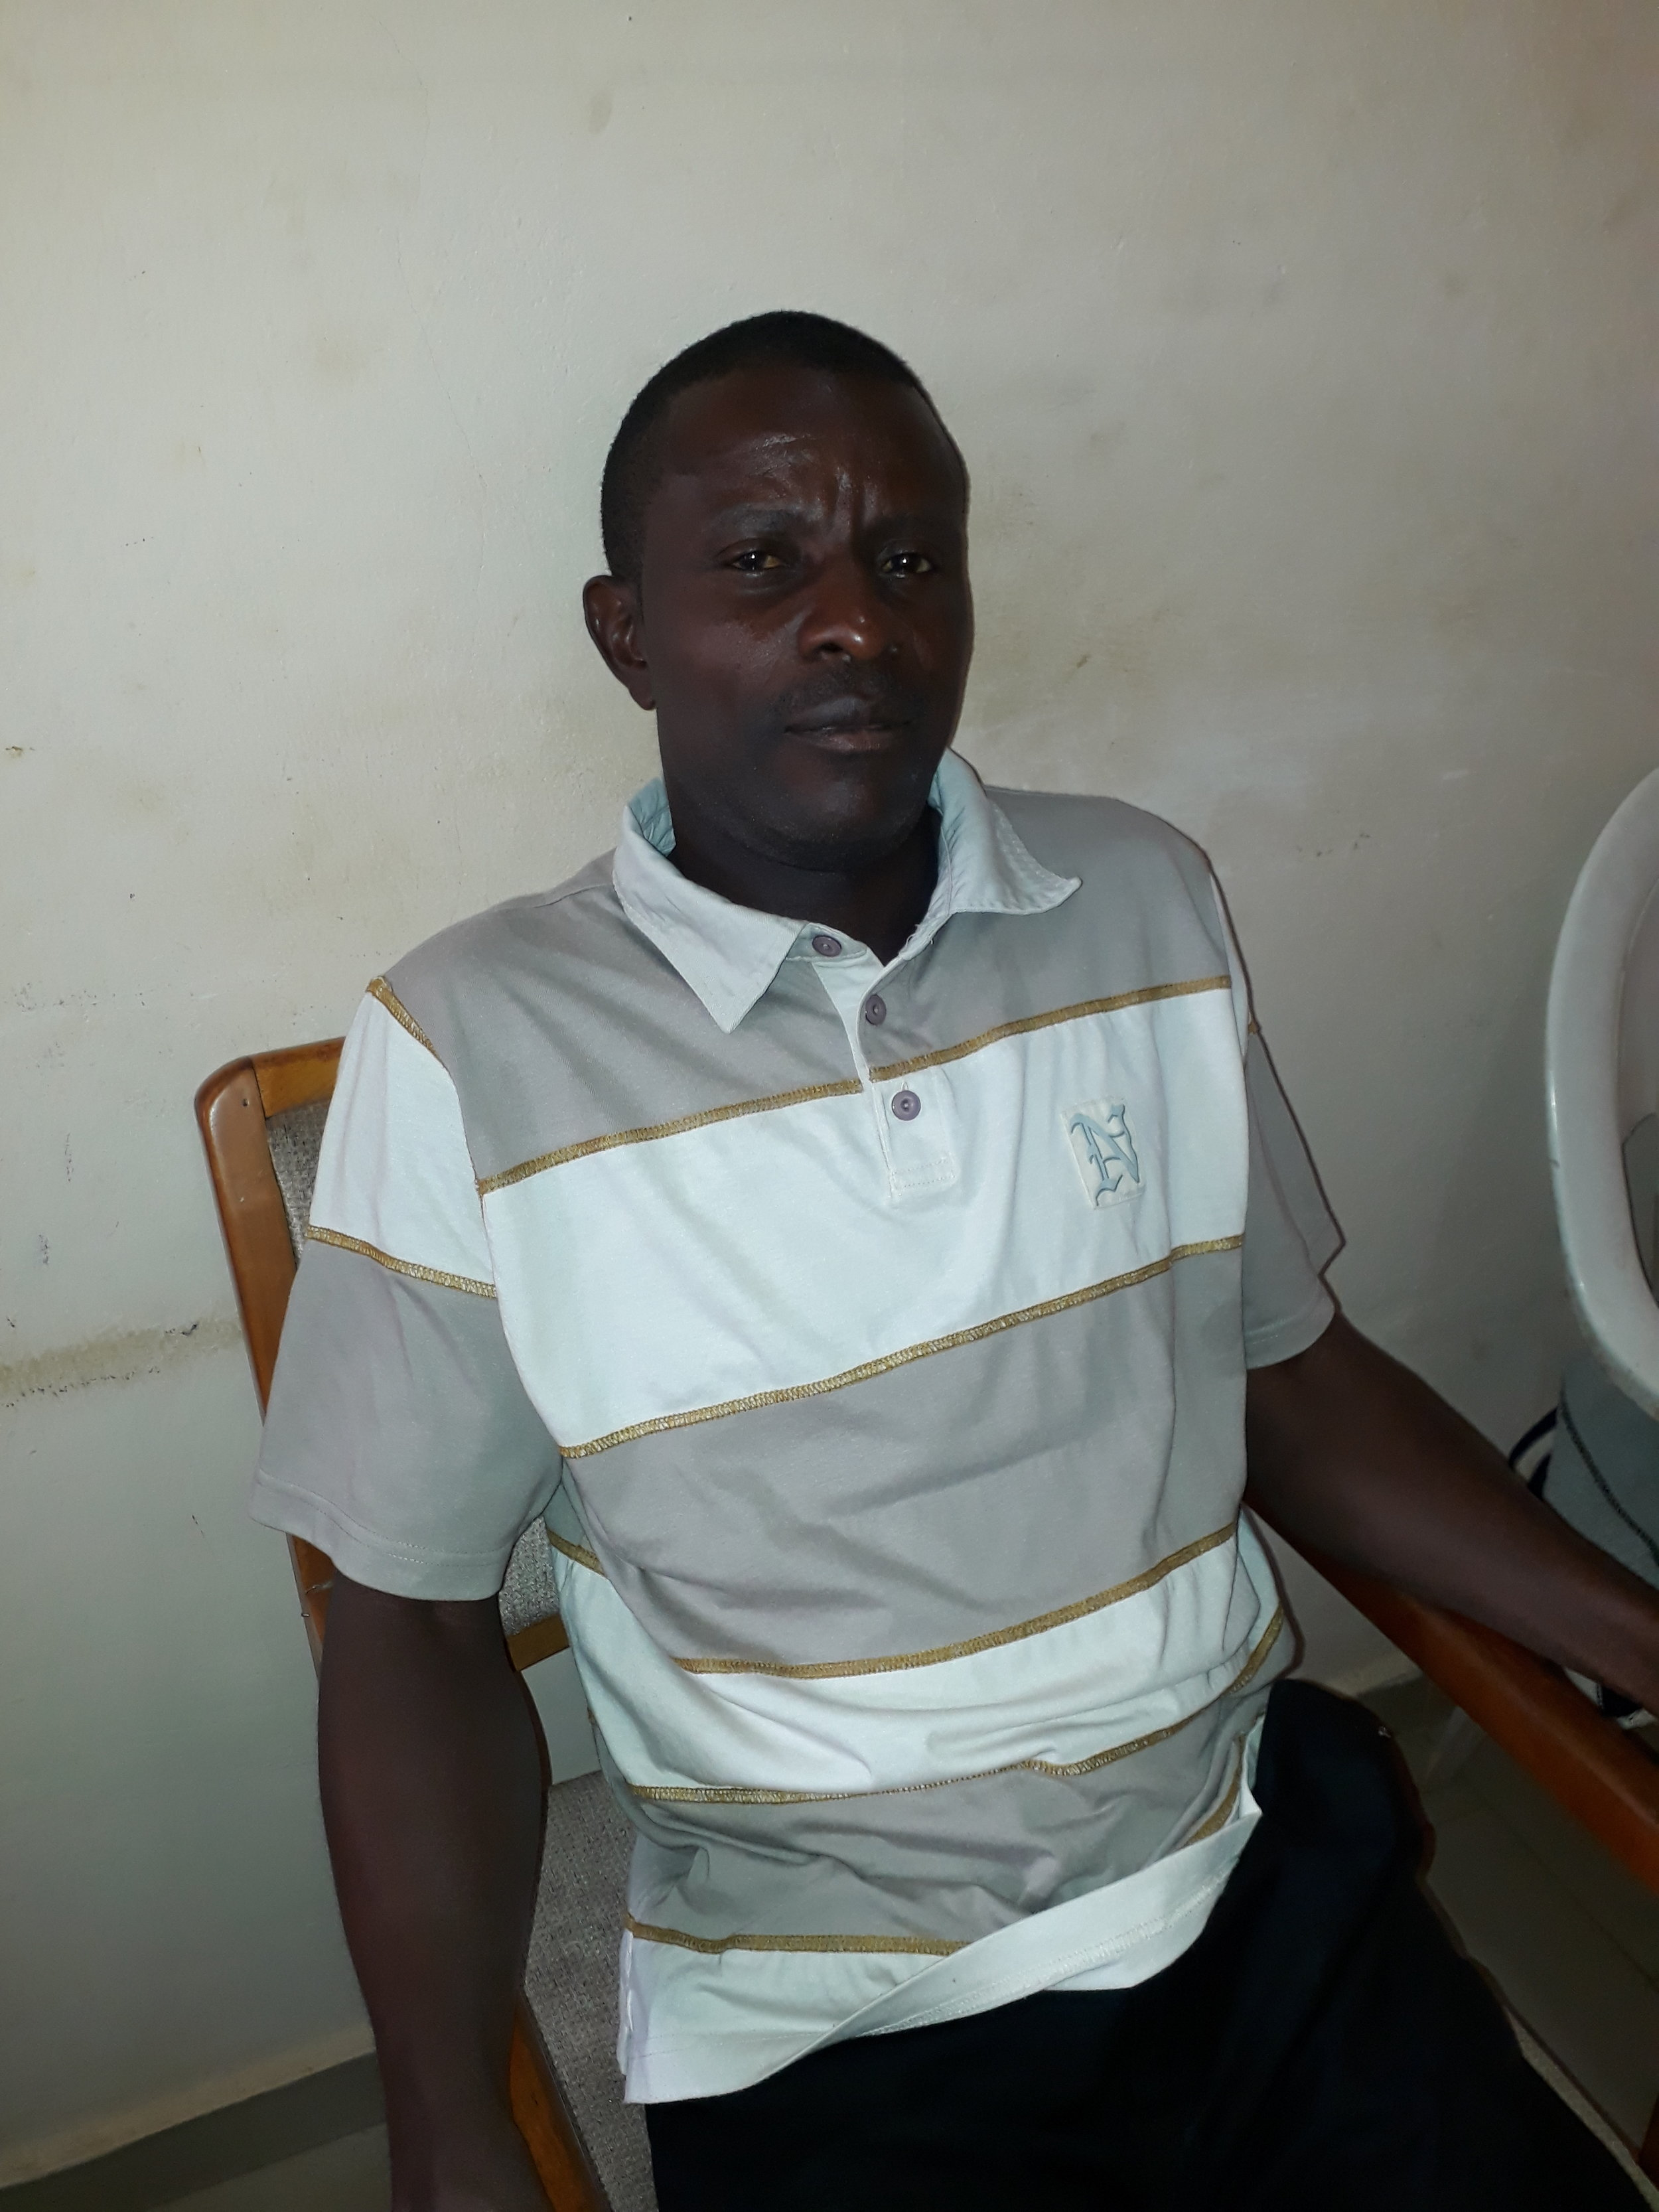 Taslim Yusuf, Transport Officer, IMC. Mobile number: 0806-551-0575